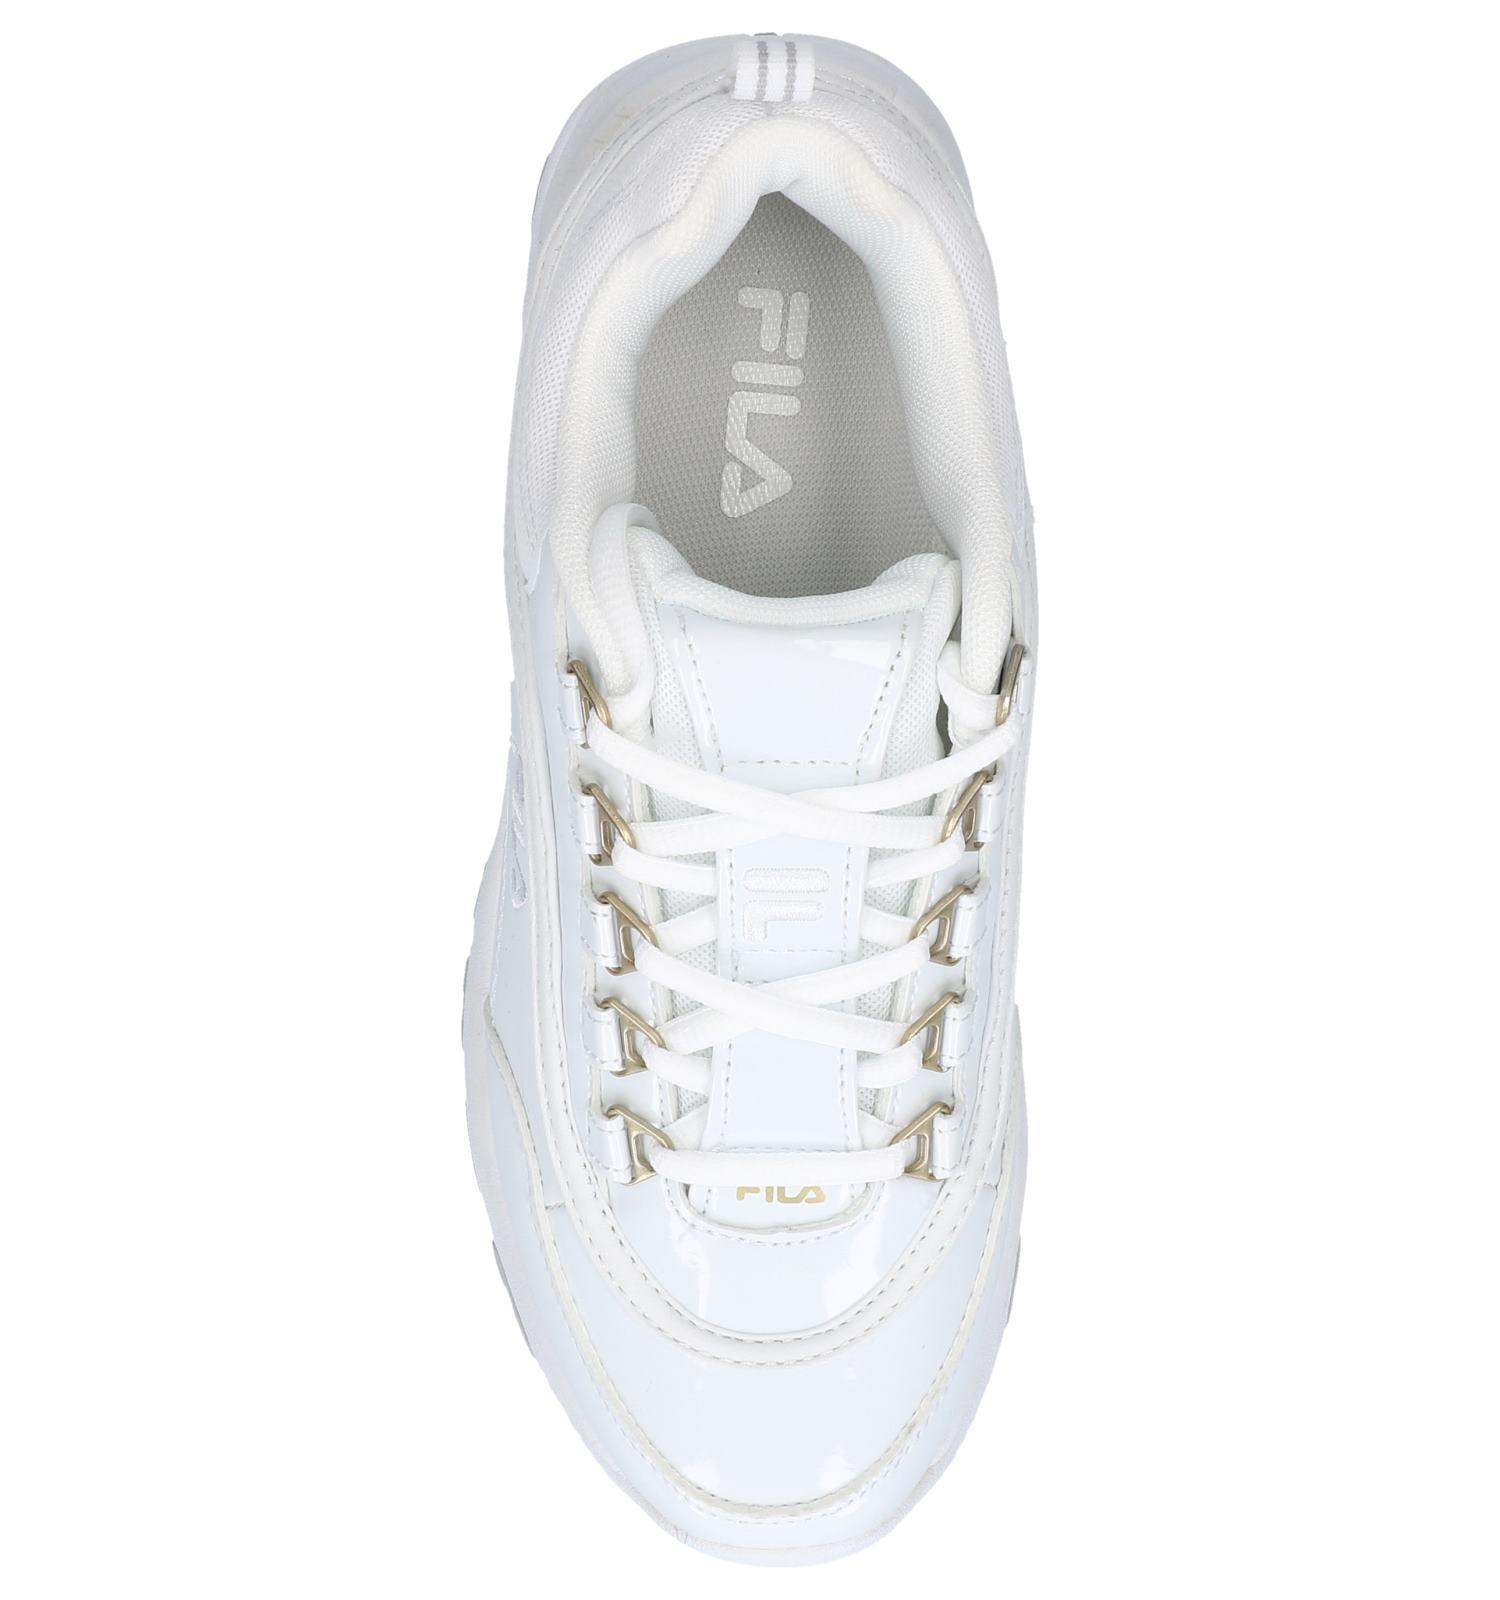 d4cb44b8e78 Witte Sneakers Fila Strada Low | TORFS.BE | Gratis verzend en retour